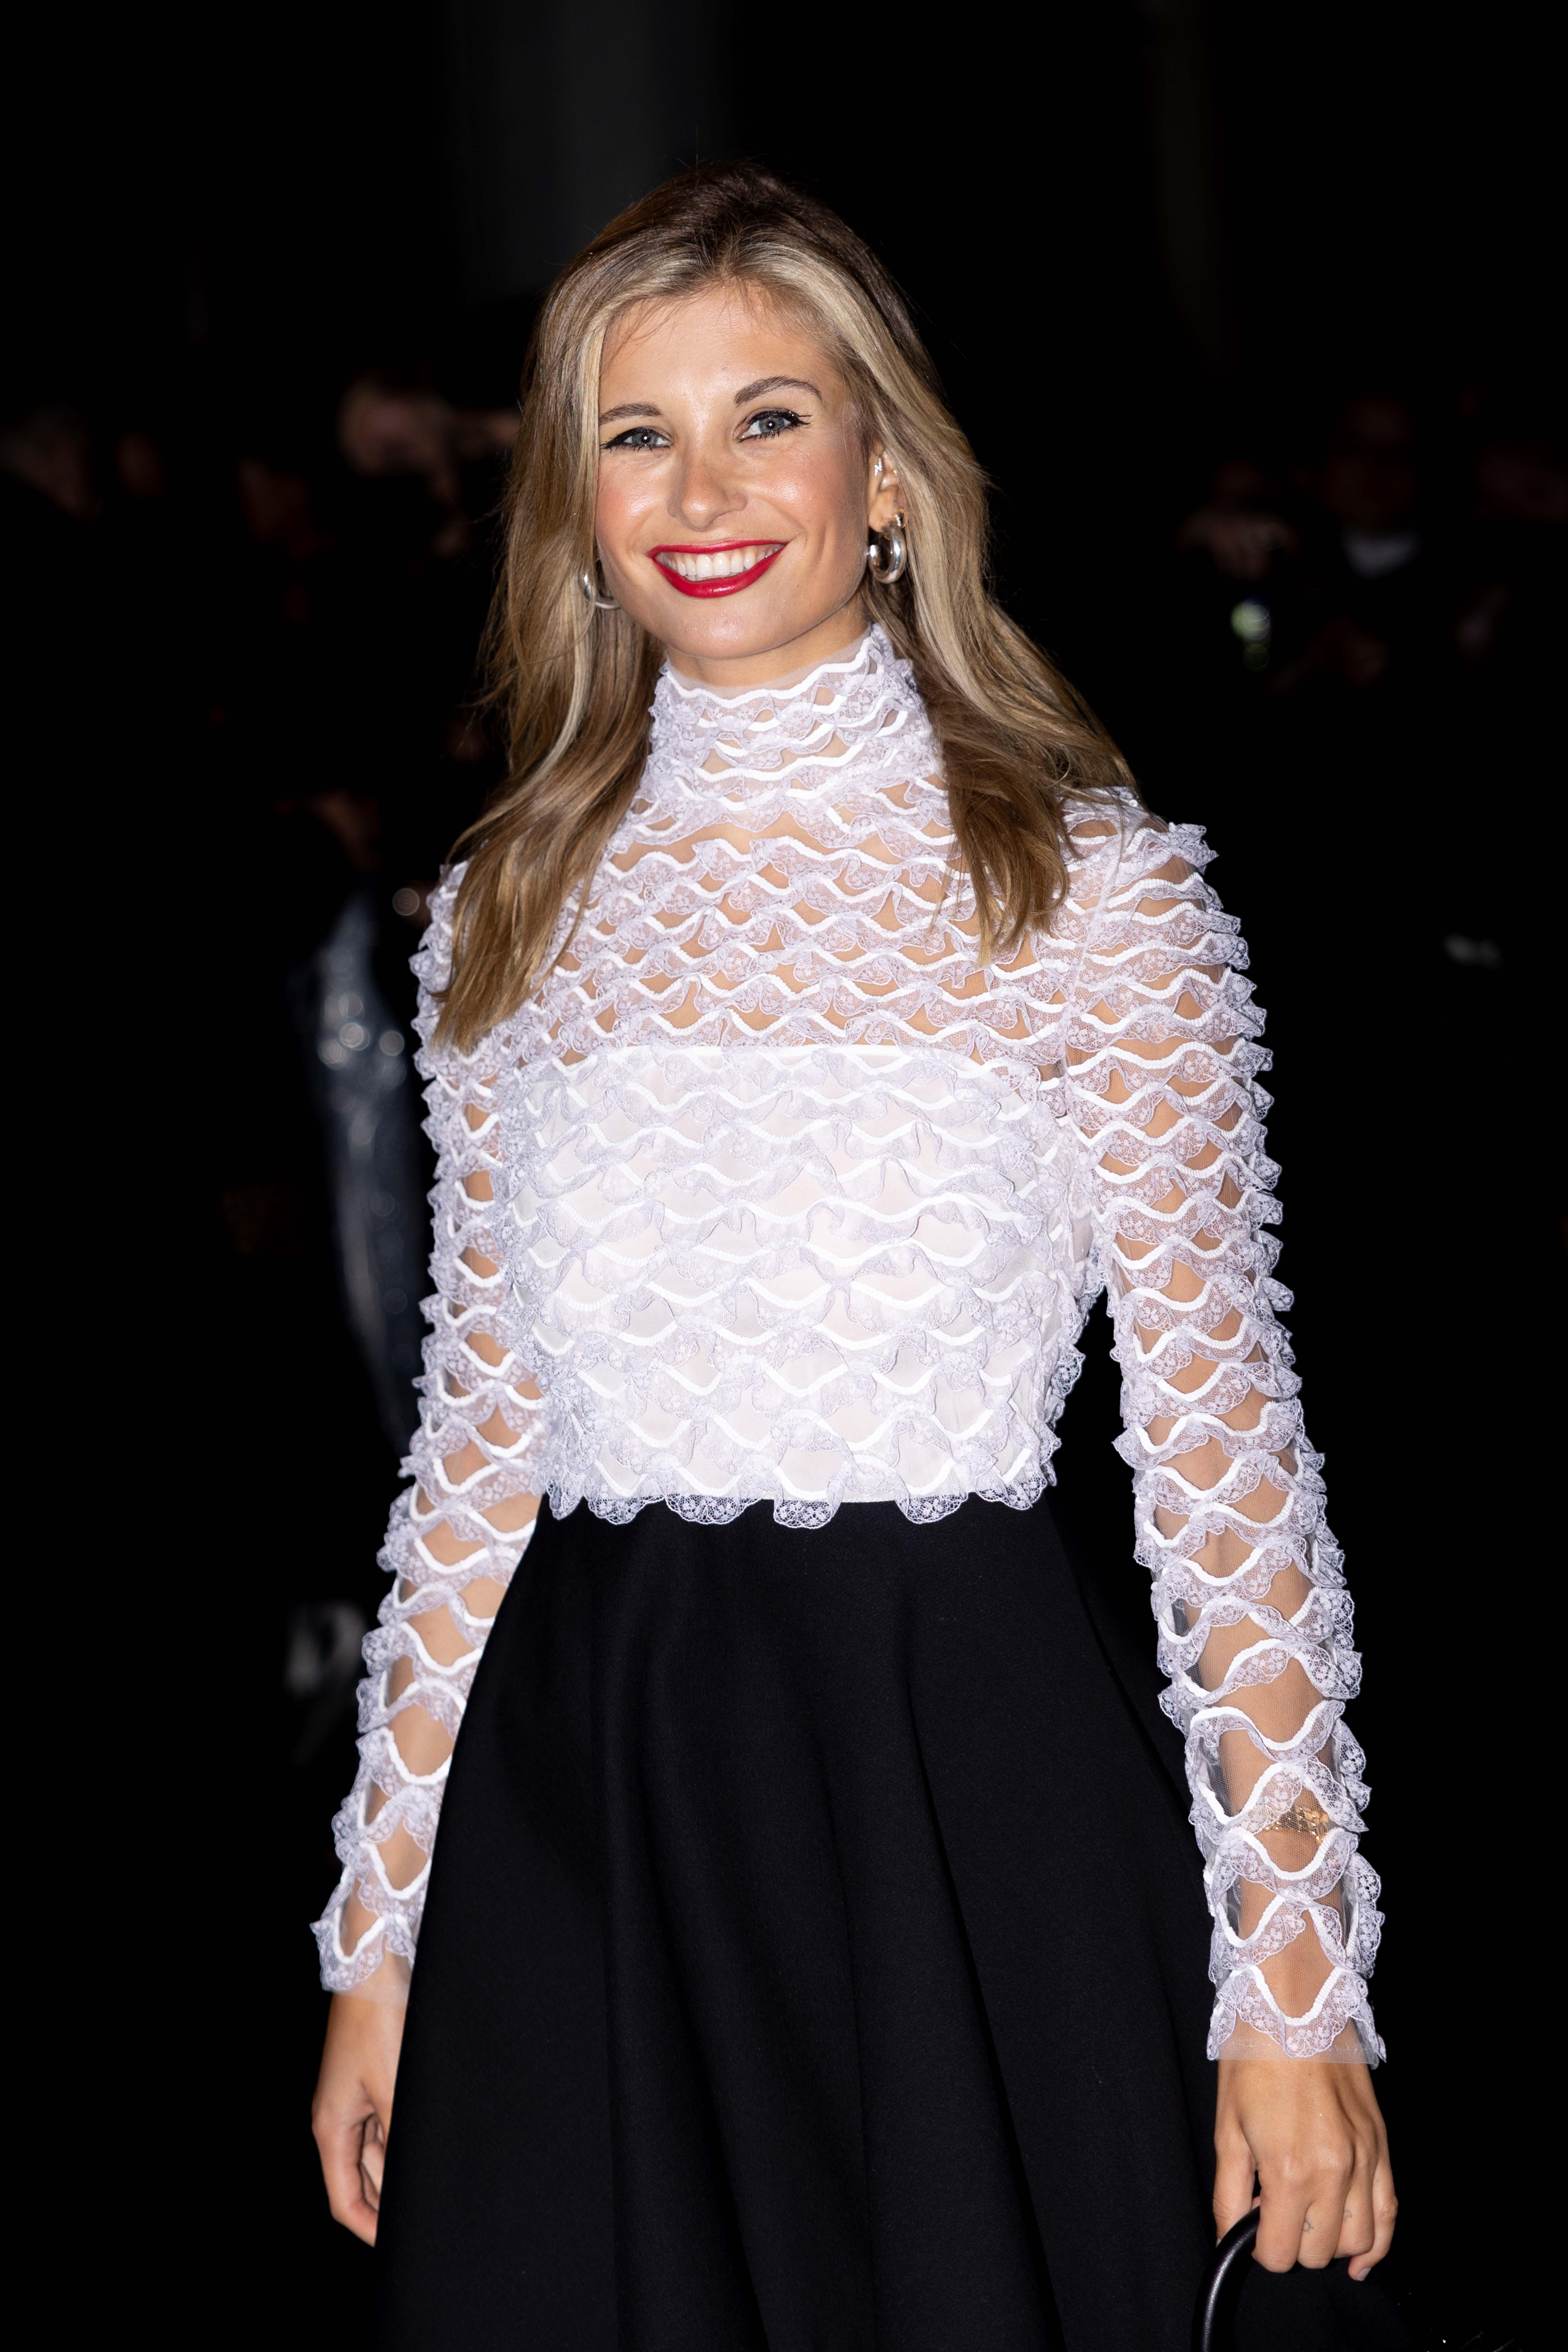 Xenia Adonts Street Style Before Valentino vParis Fashion Week SS22